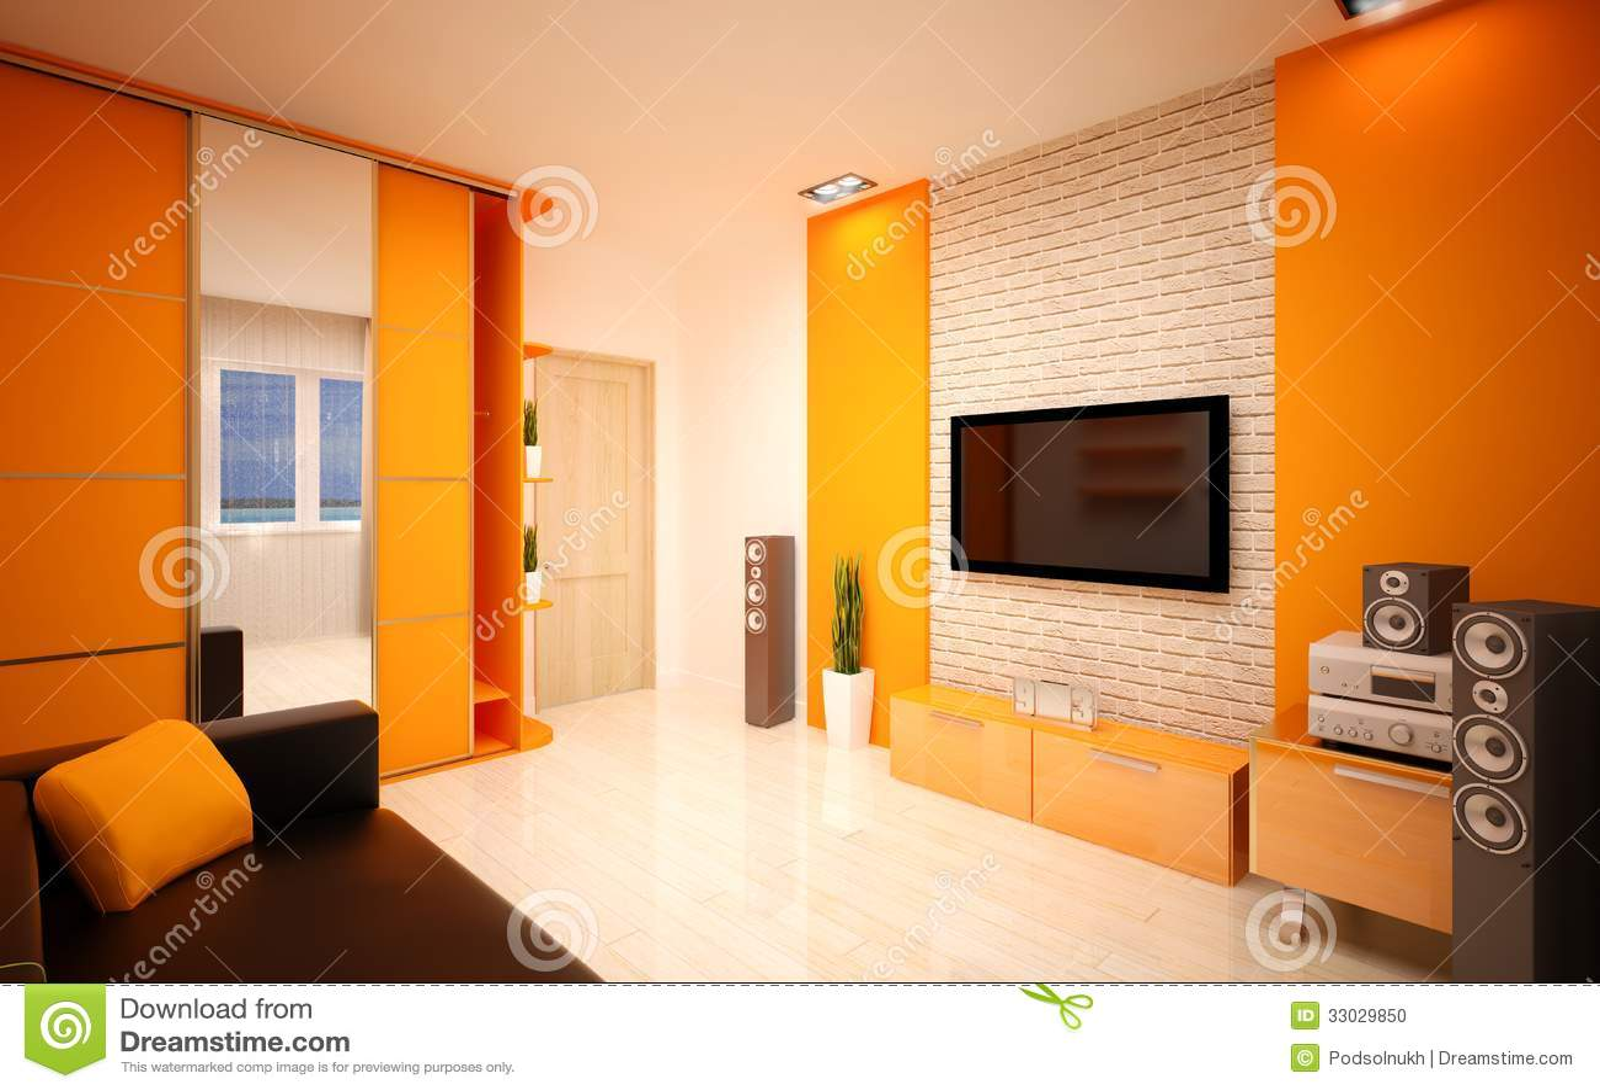 Design De Interiores. Sala De Visitas Moderna Foto de ... - photo#17